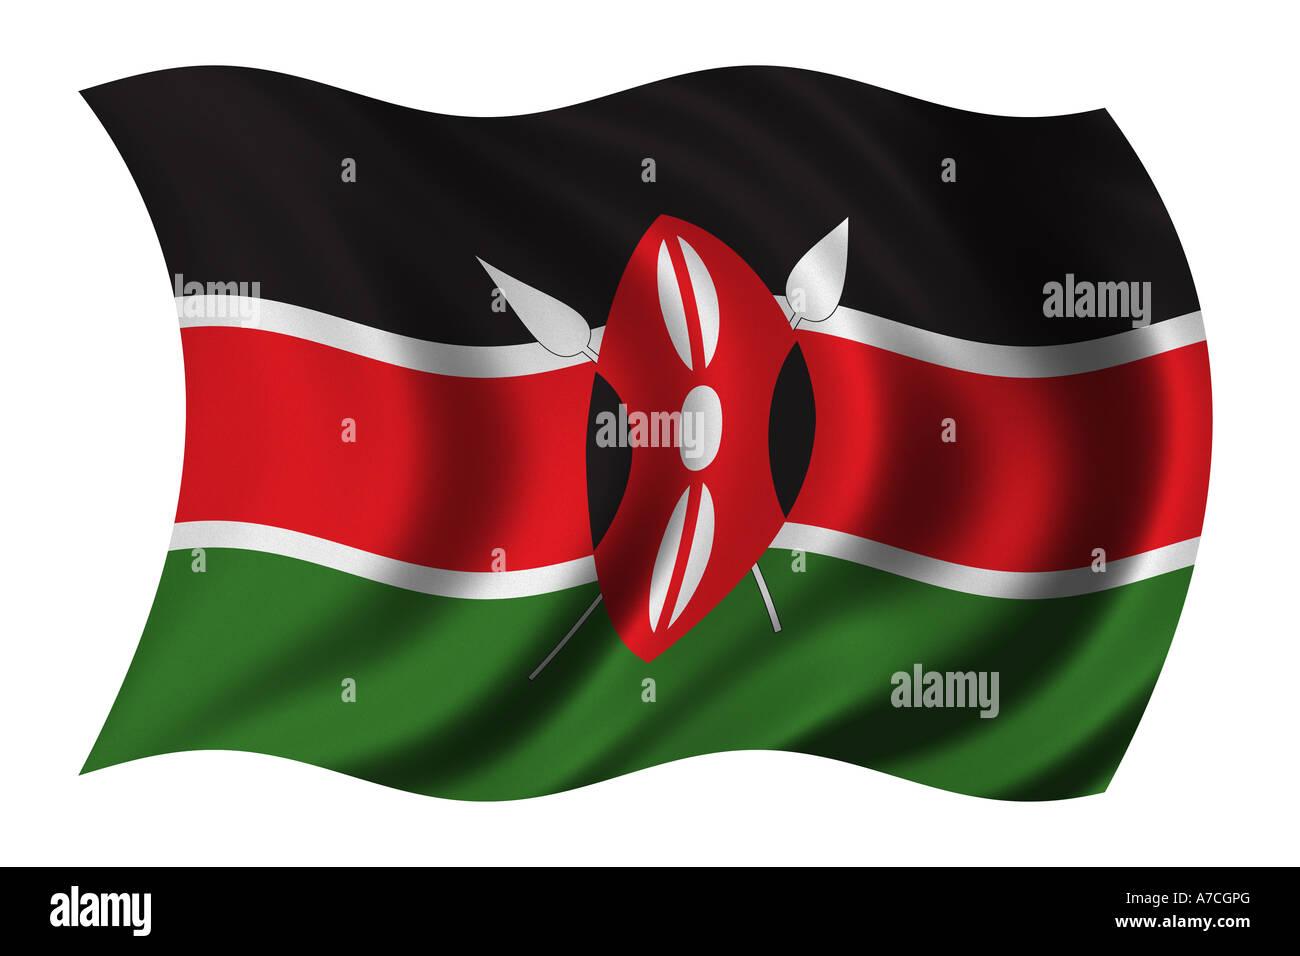 Flag of Kenya Stock Photo